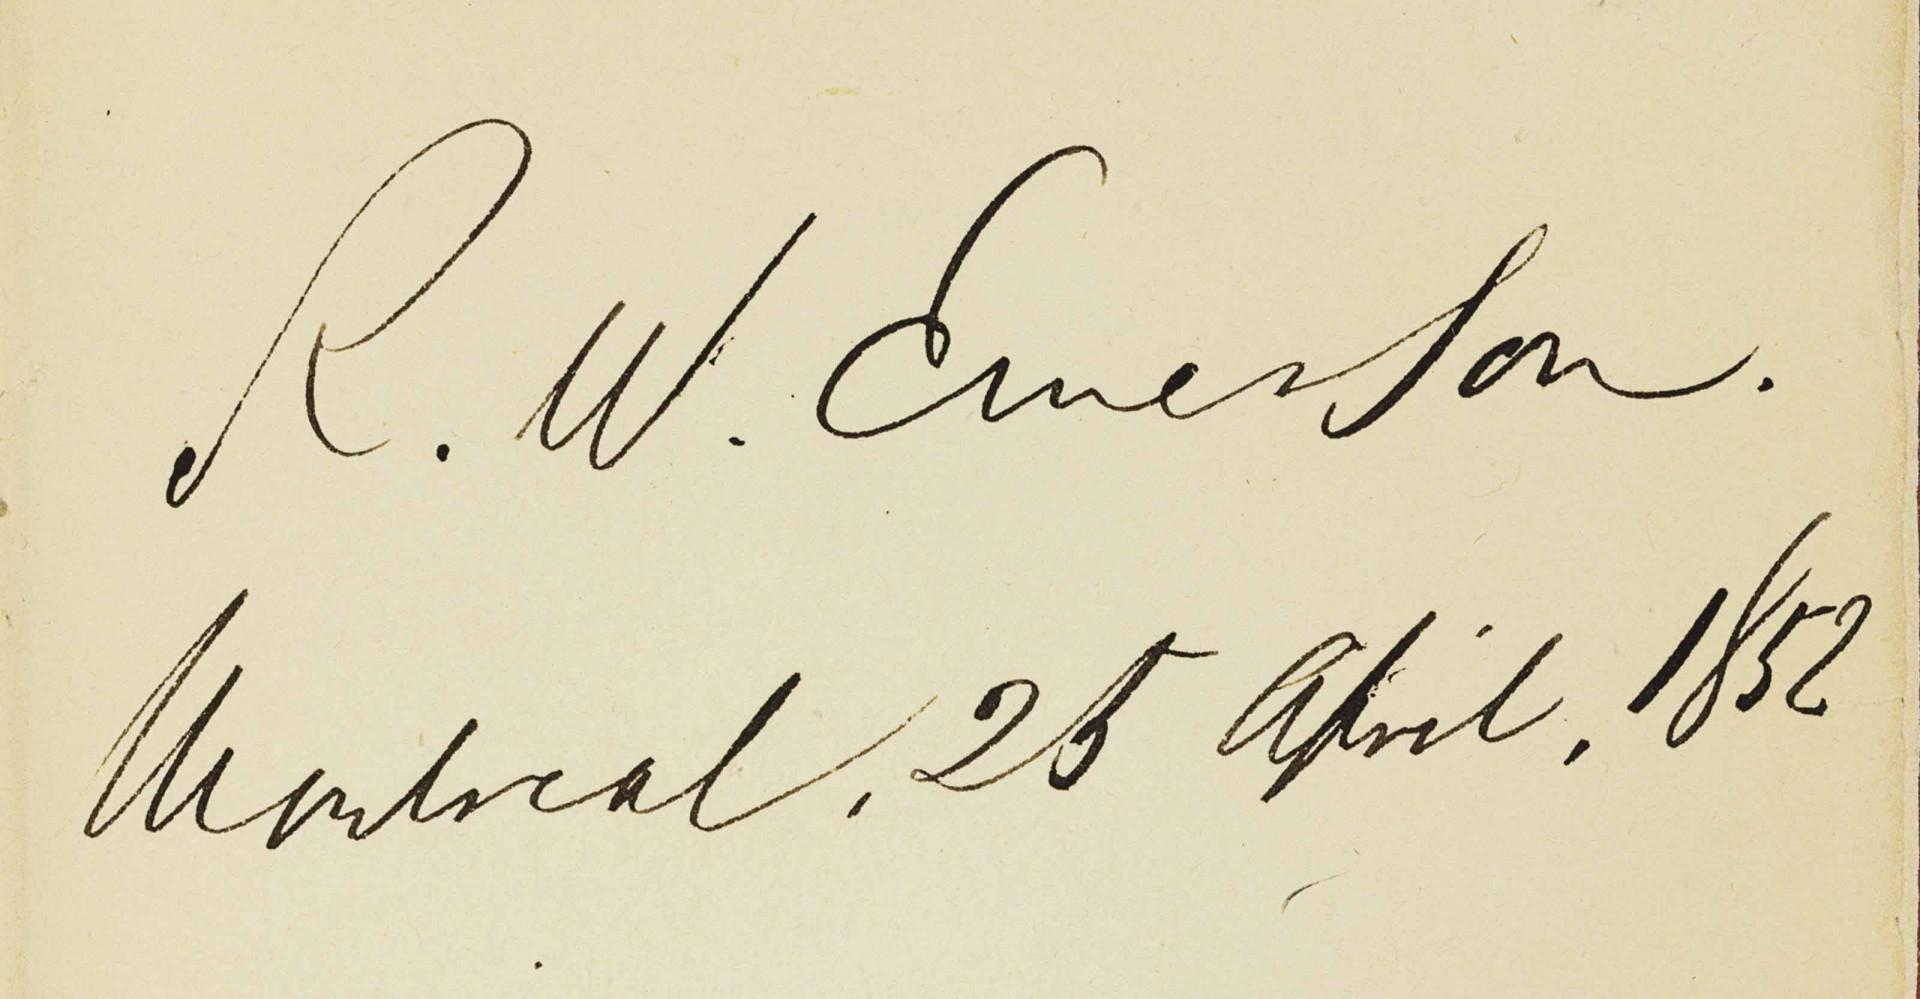 021 Essays First Series 2014 Nyr 02861 0225 000emerson Ralph Waldo Boston James Munroe 1850 Essay Stunning Emerson Pdf Shelburne Publisher 1920